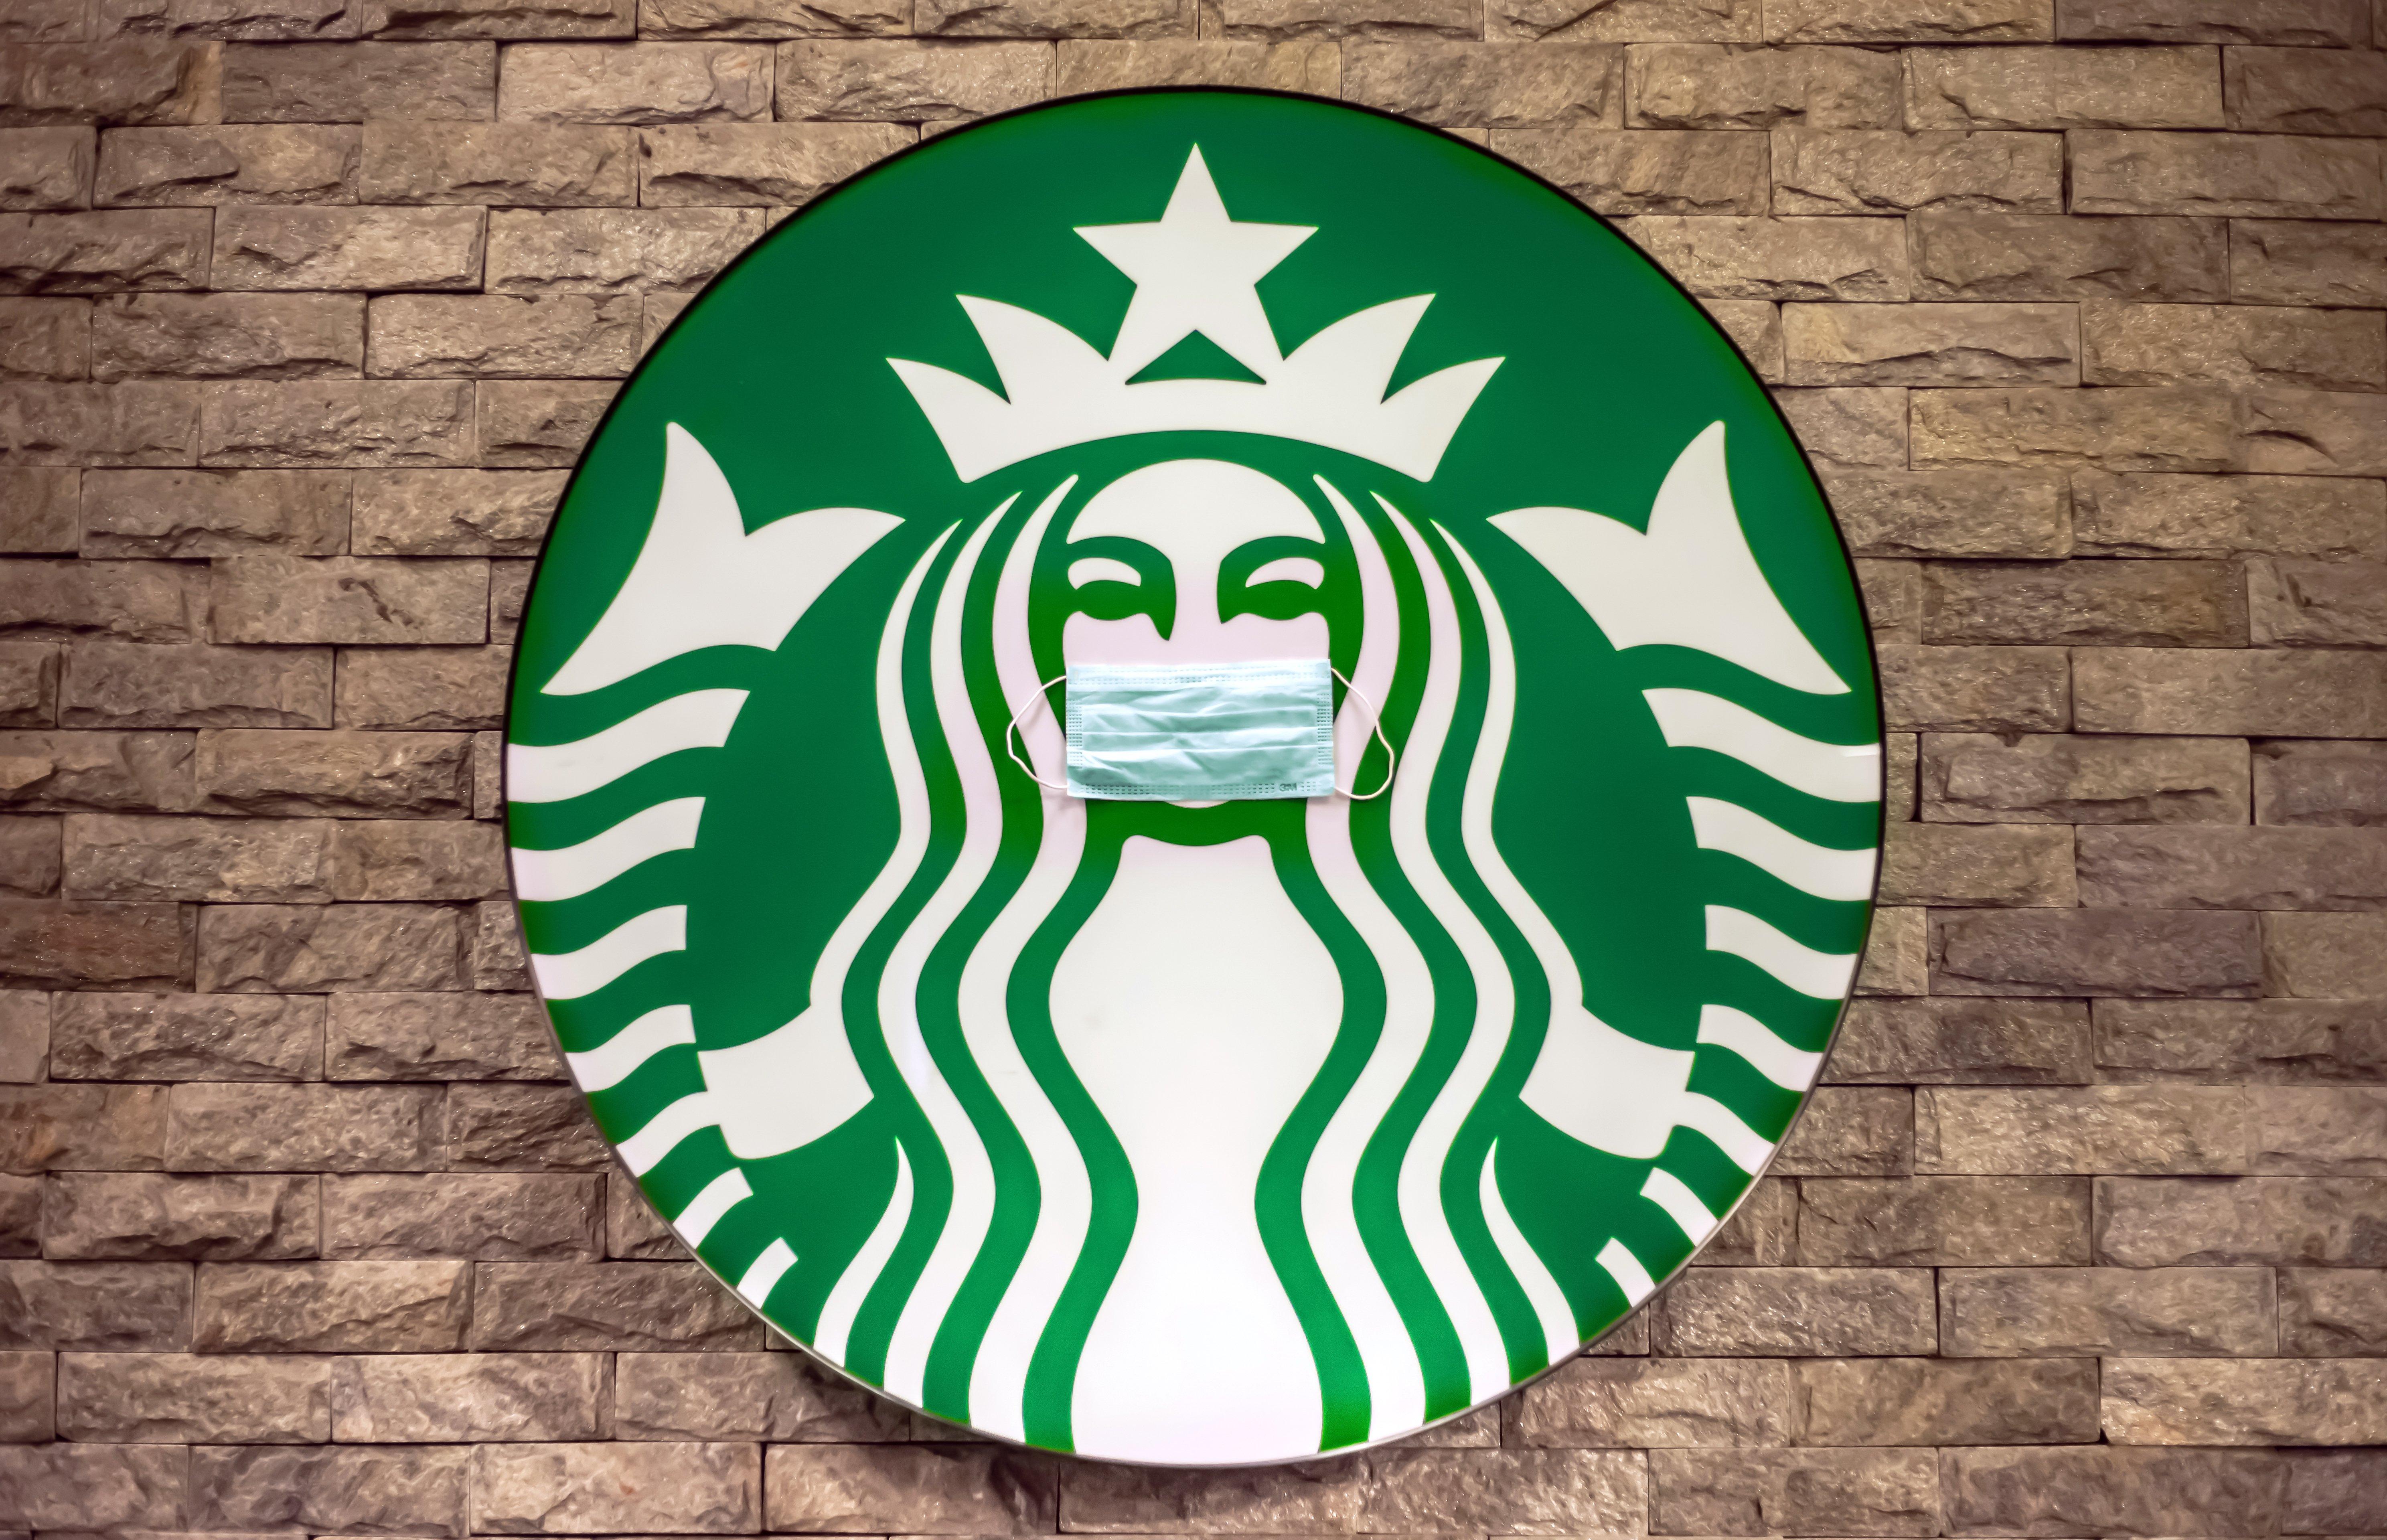 food service market research starbucks face mask logo